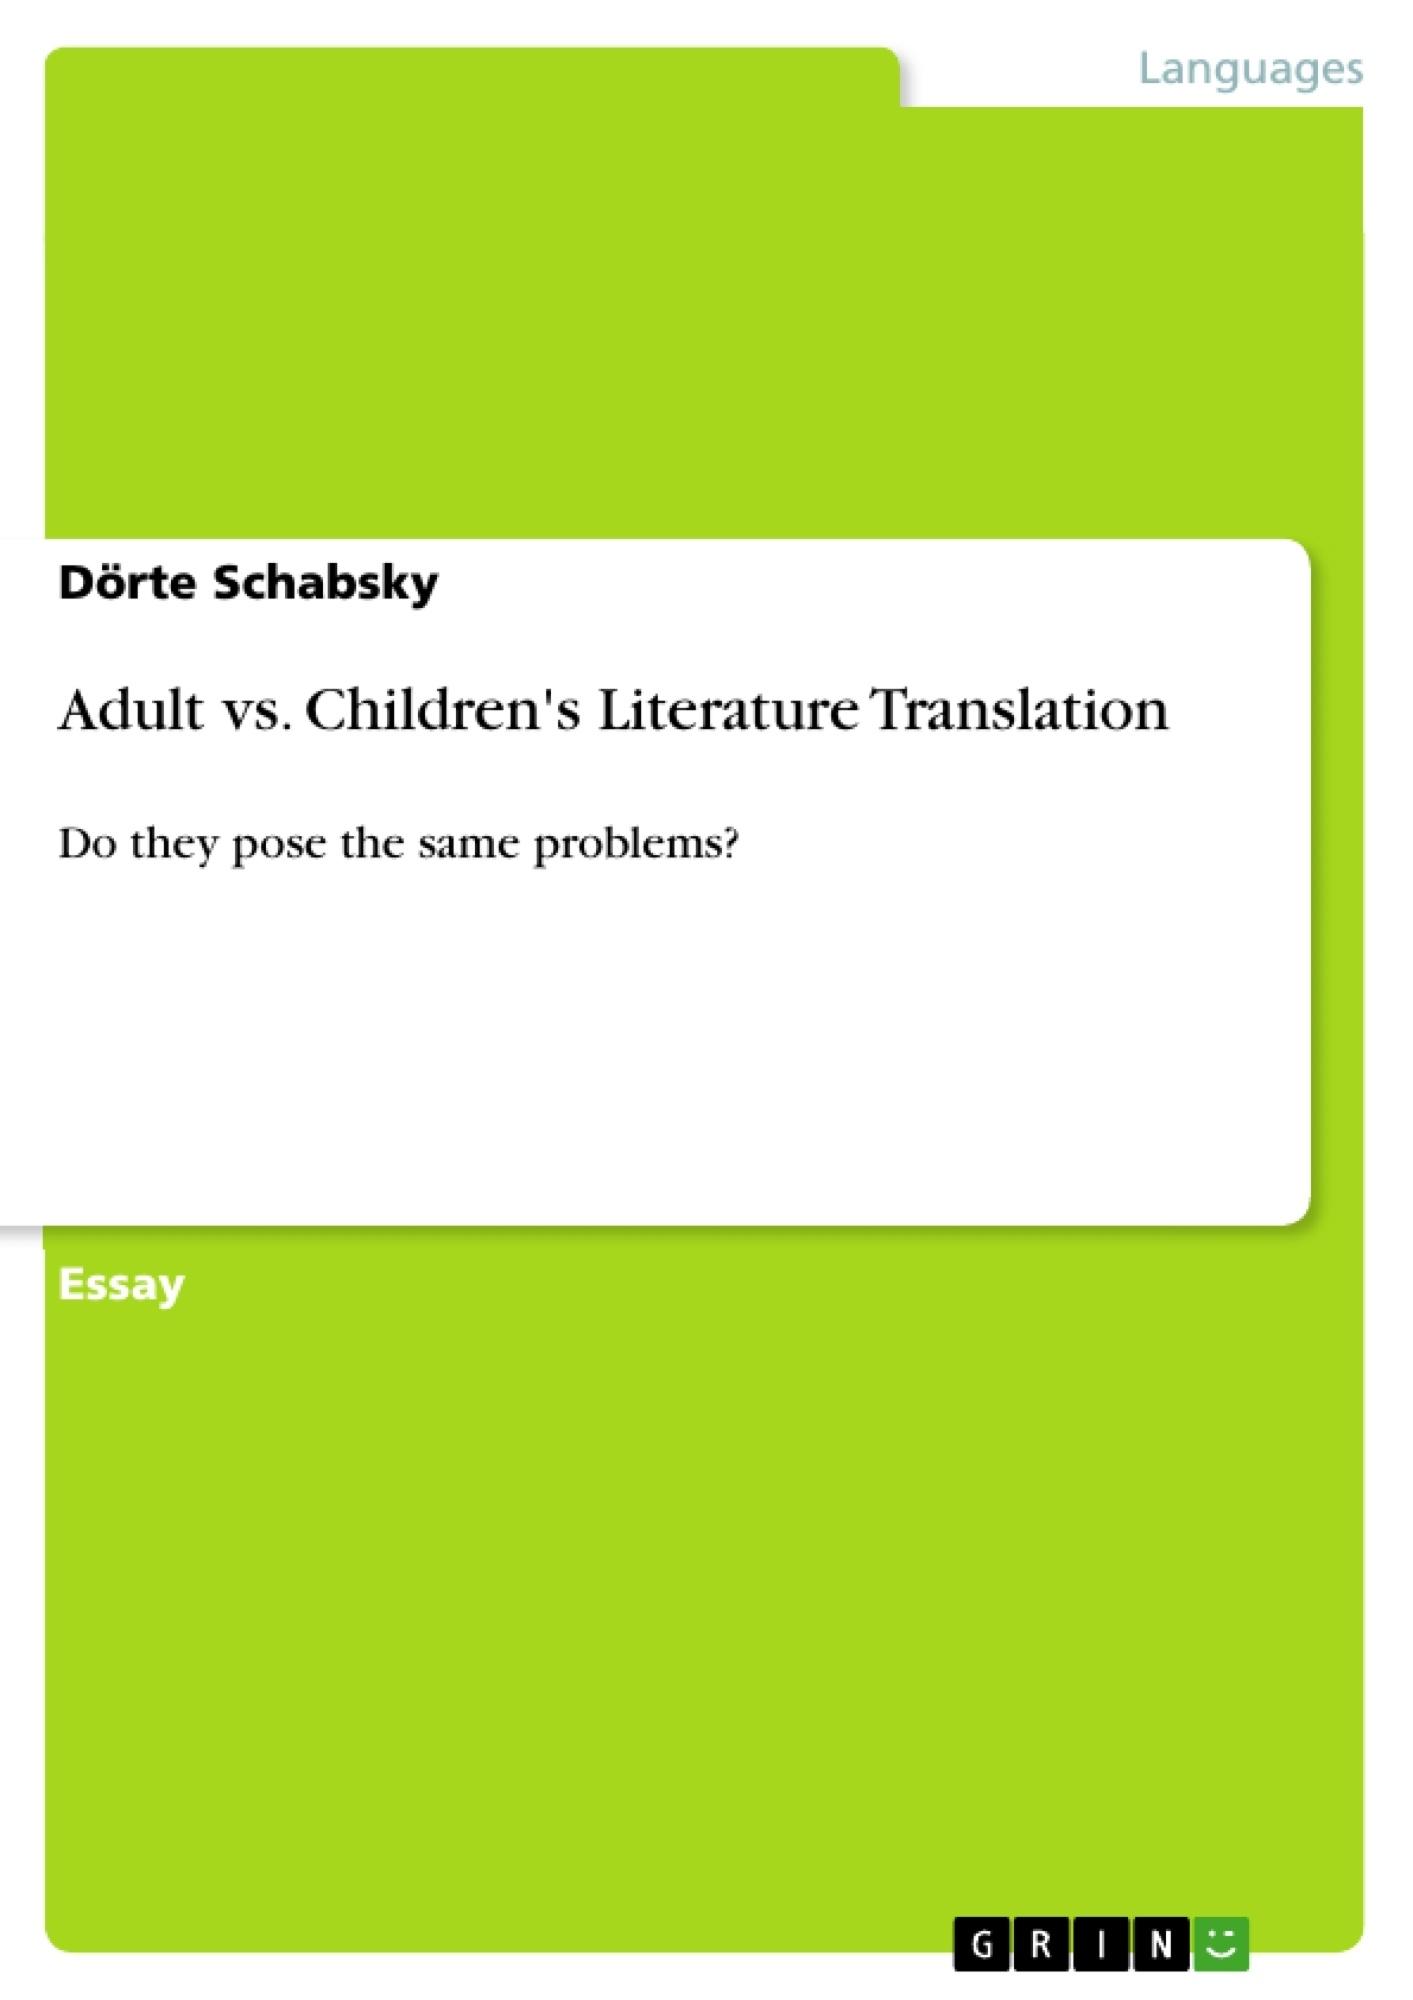 Title: Adult vs. Children's Literature Translation